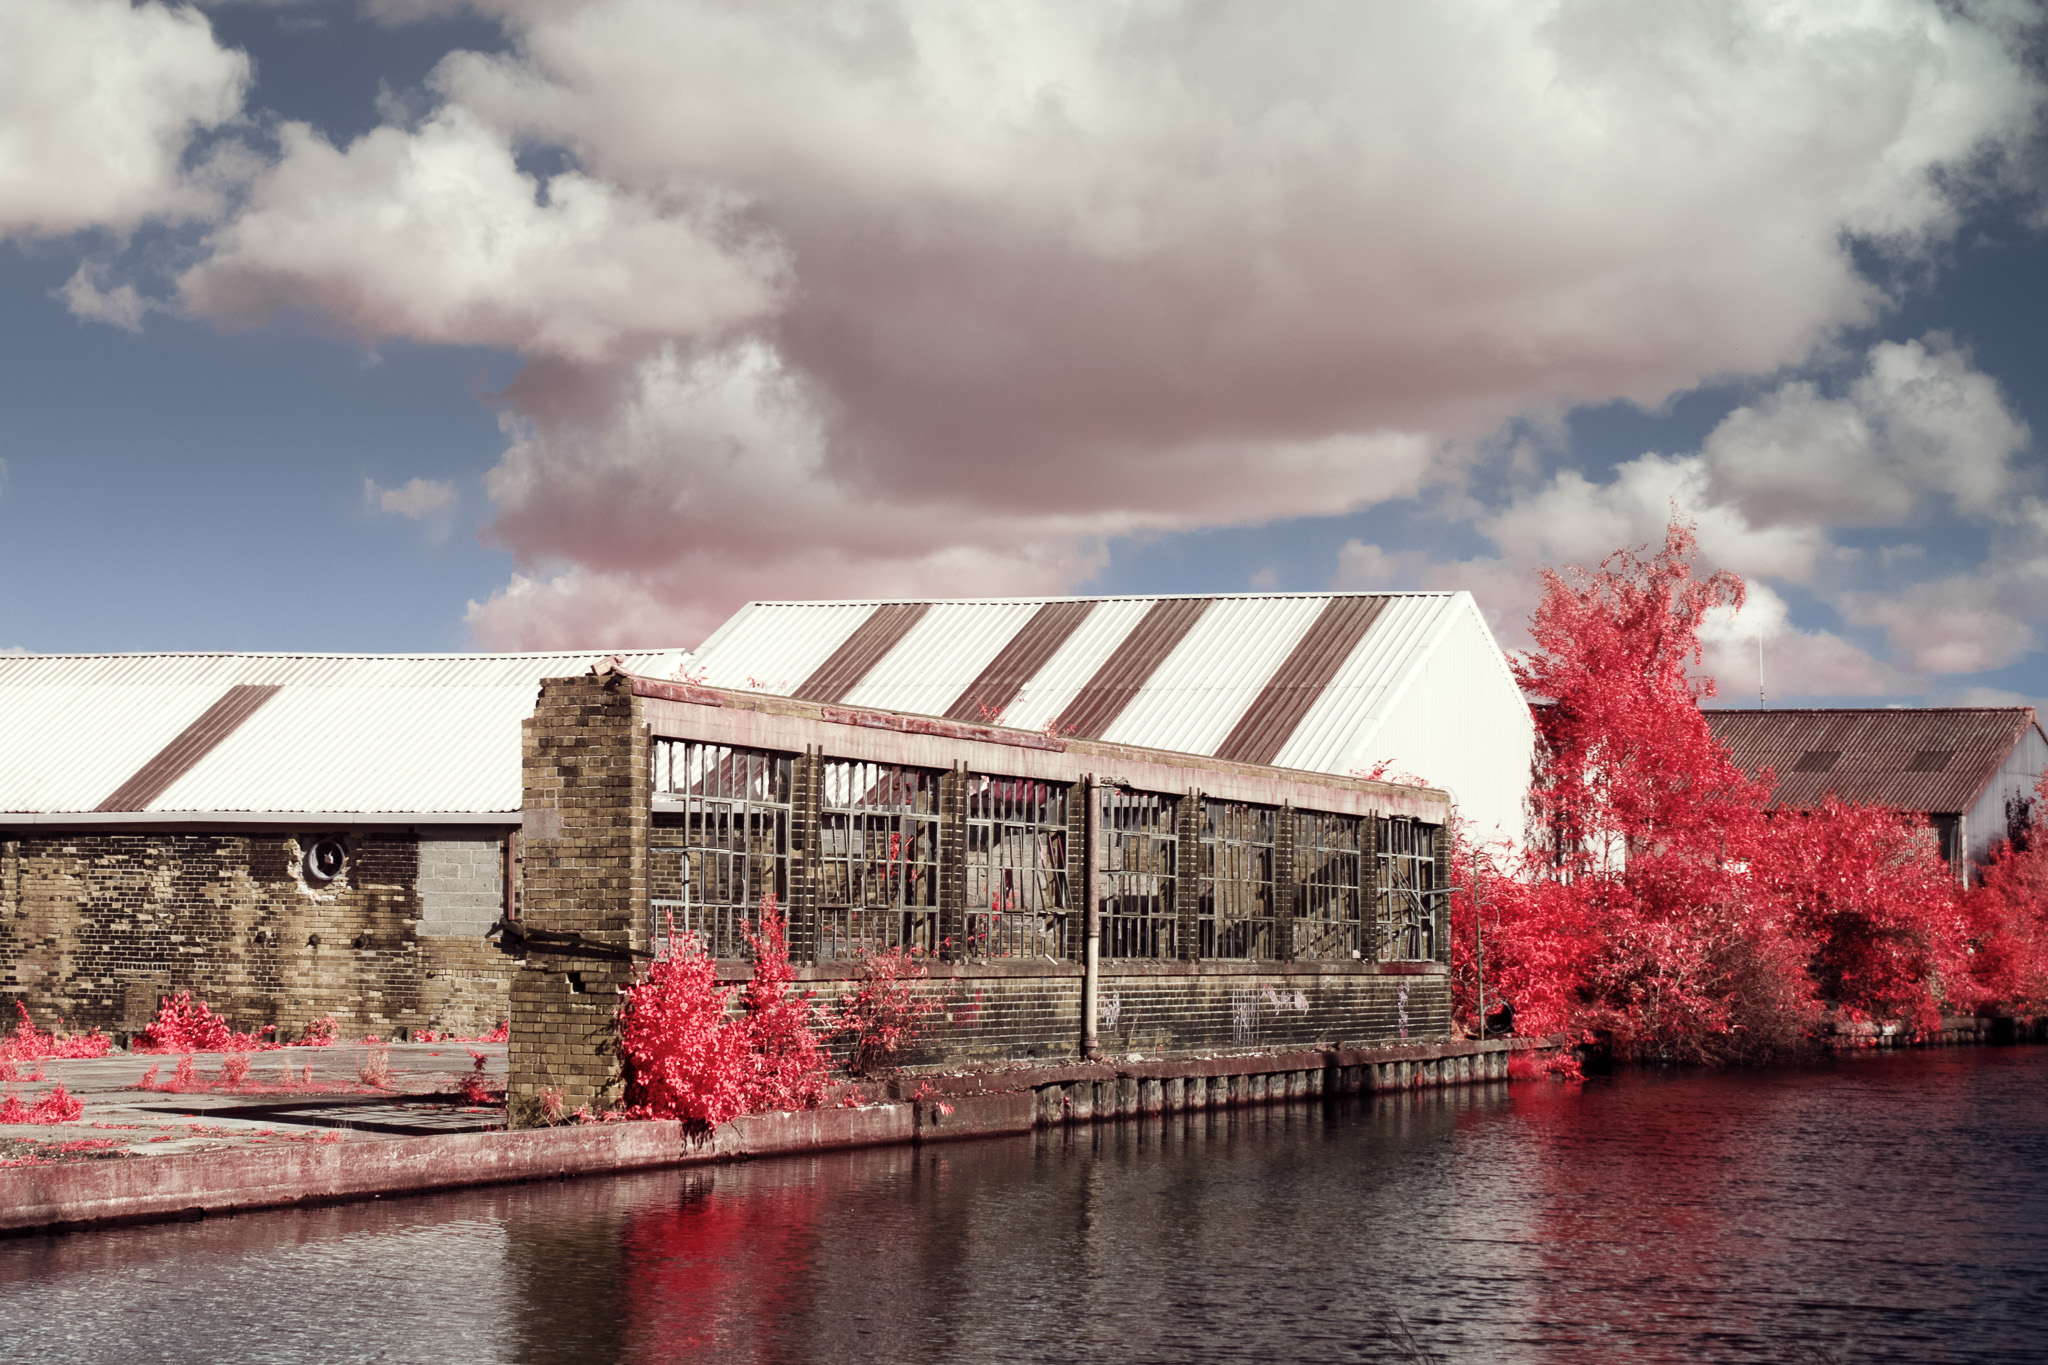 Kodak EIR Colour Infrared, Edgelands, Wasteland, Out of sight,  Canal 2 ©Jonny Sutton